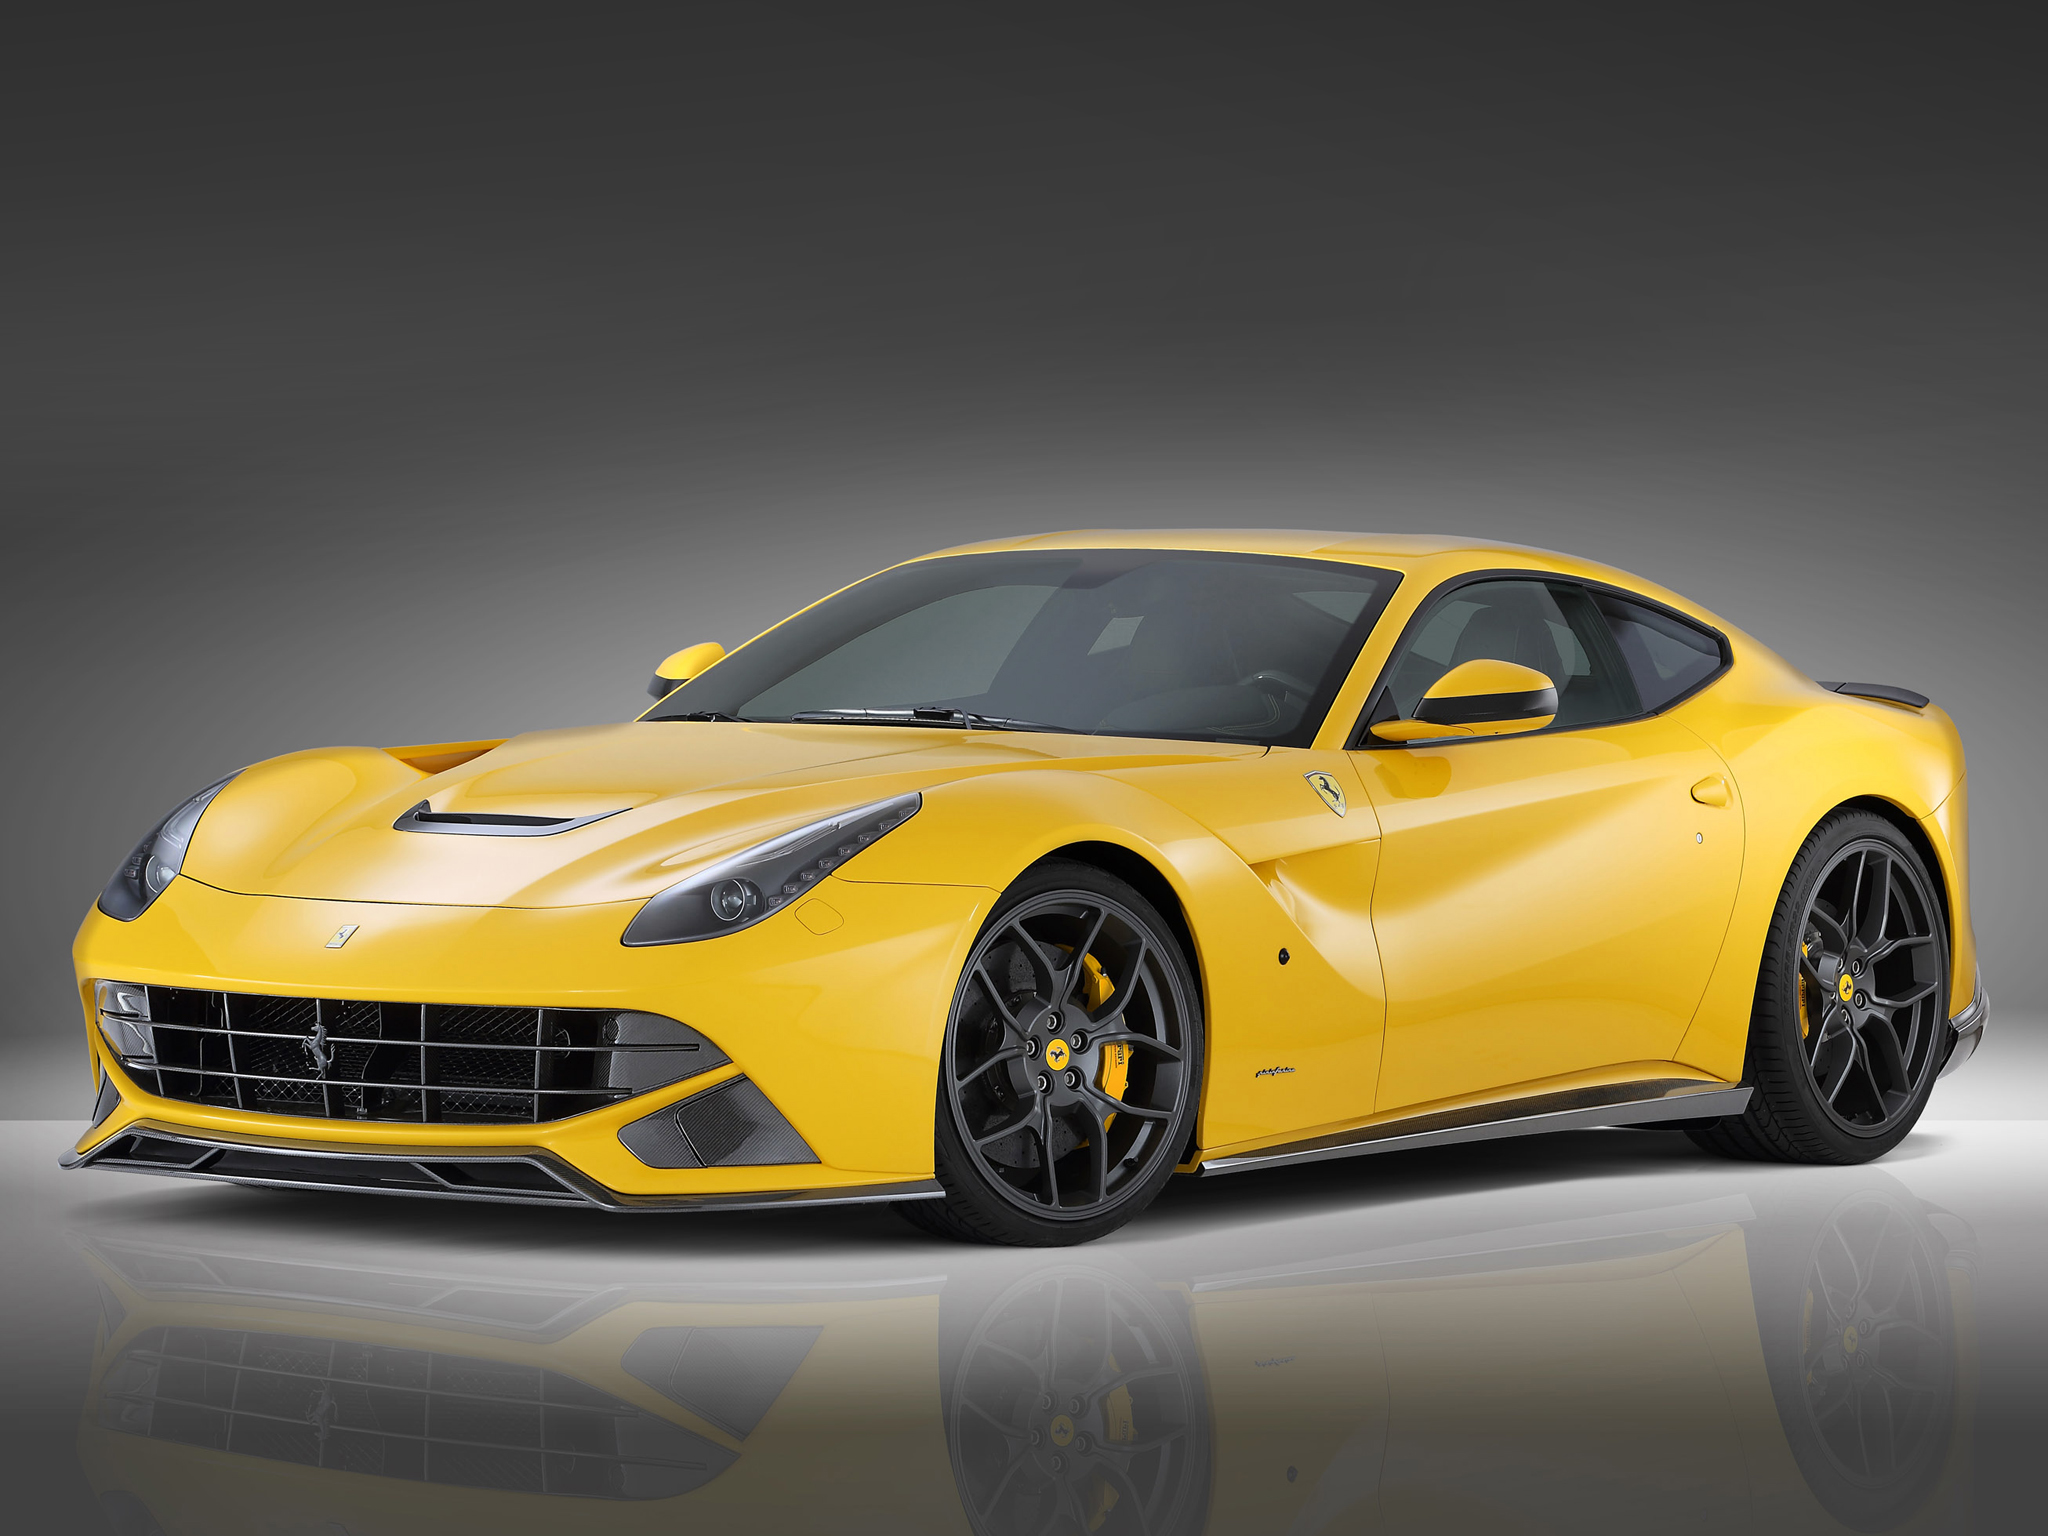 Car-wallpapers-Yellow Ferrari F12 Berlinetta-wallpaper